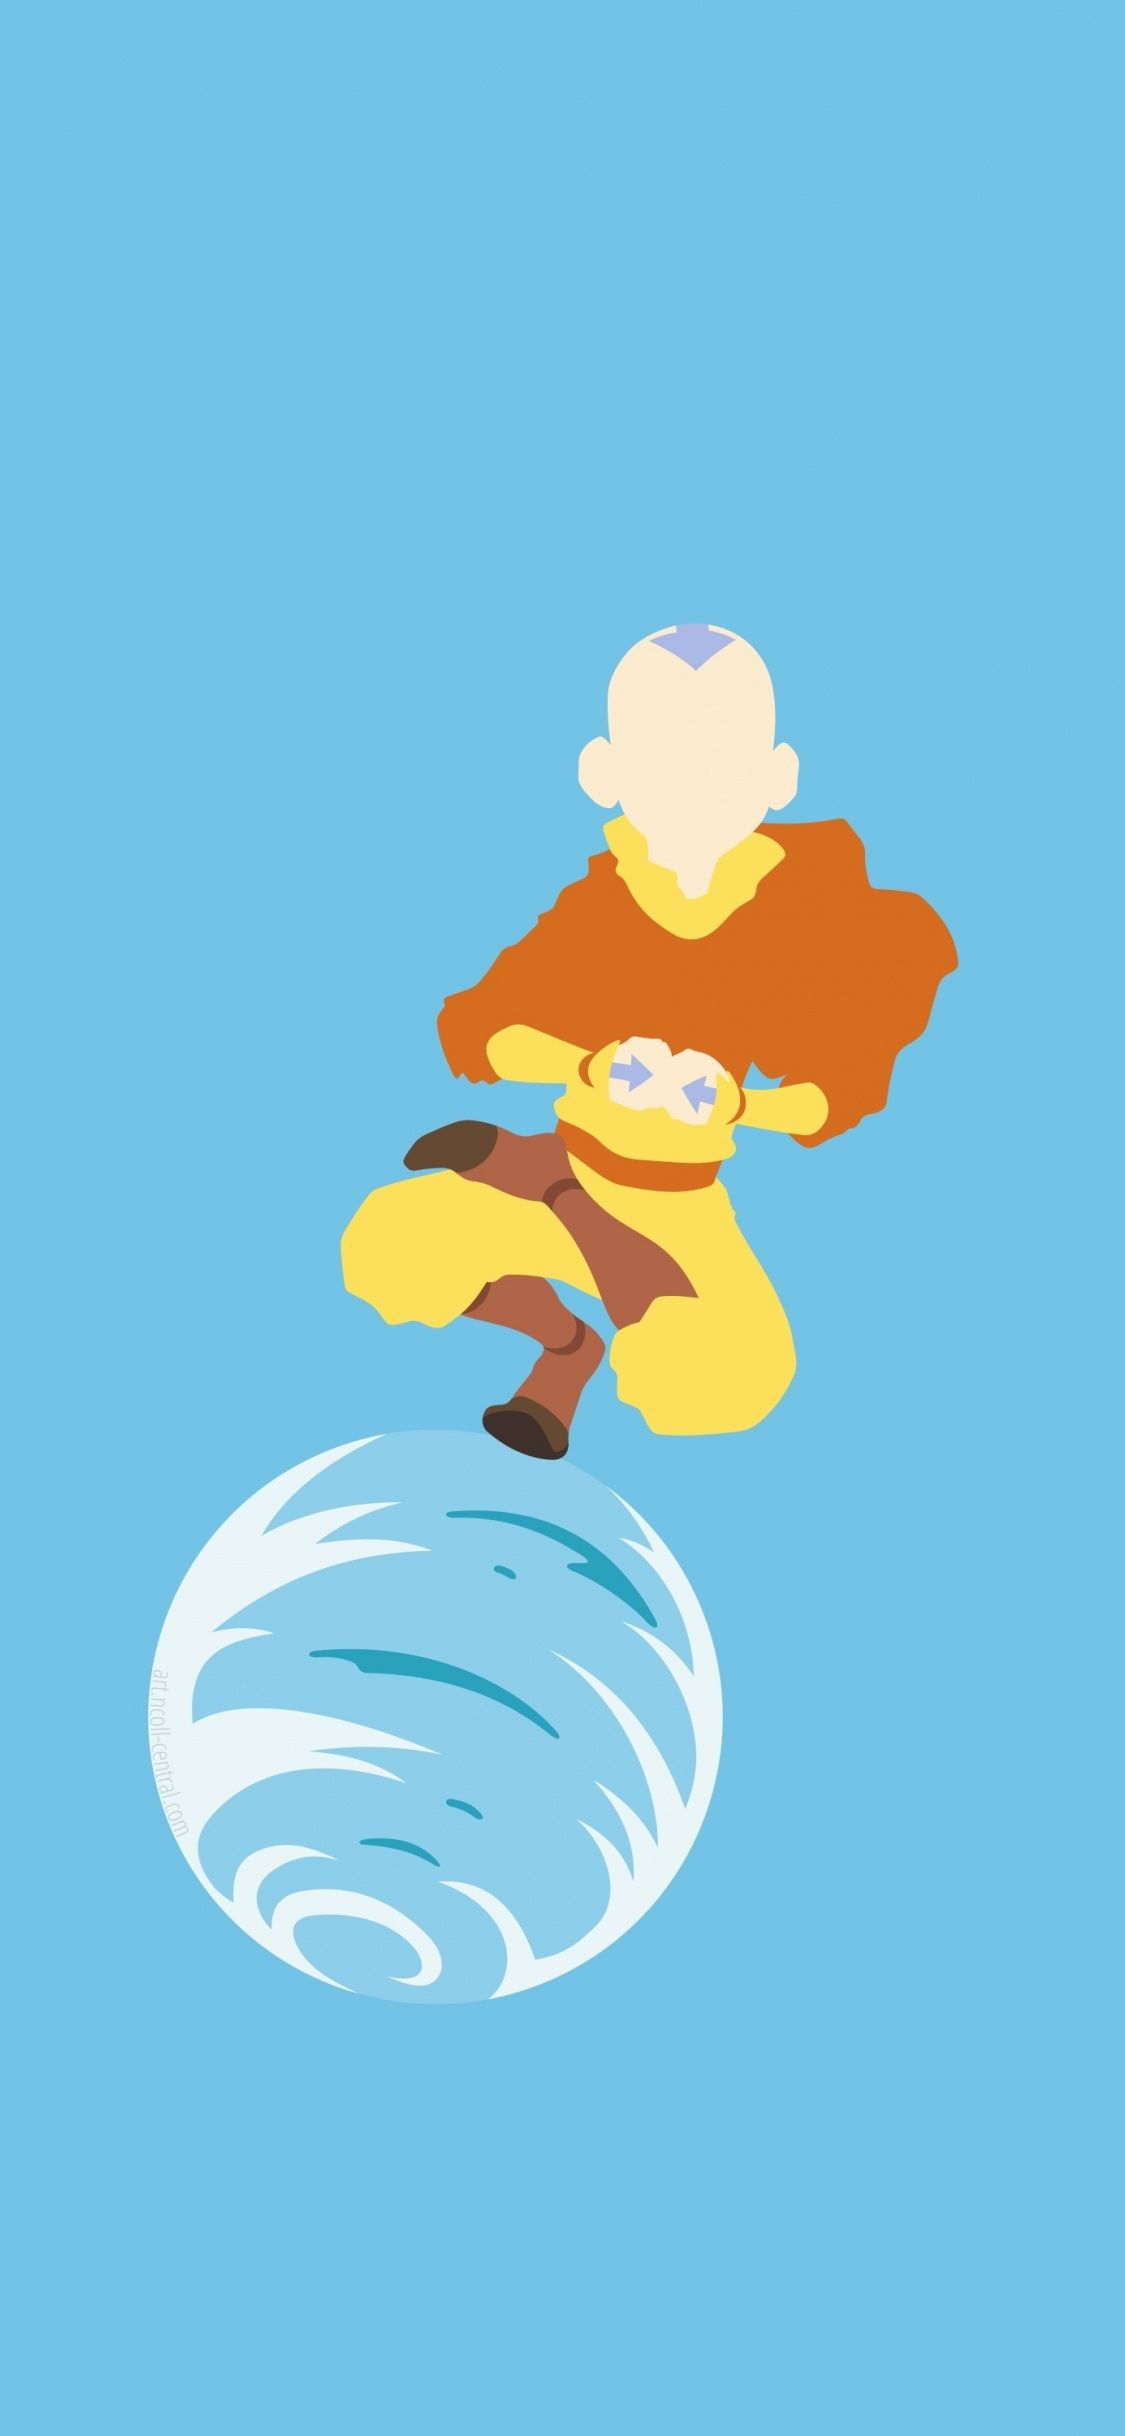 Minimal Aang Avatar The Last Airbender 1125x2436 Wallpaper Anime Wallpaper Cartoon Art Anime Fantasy